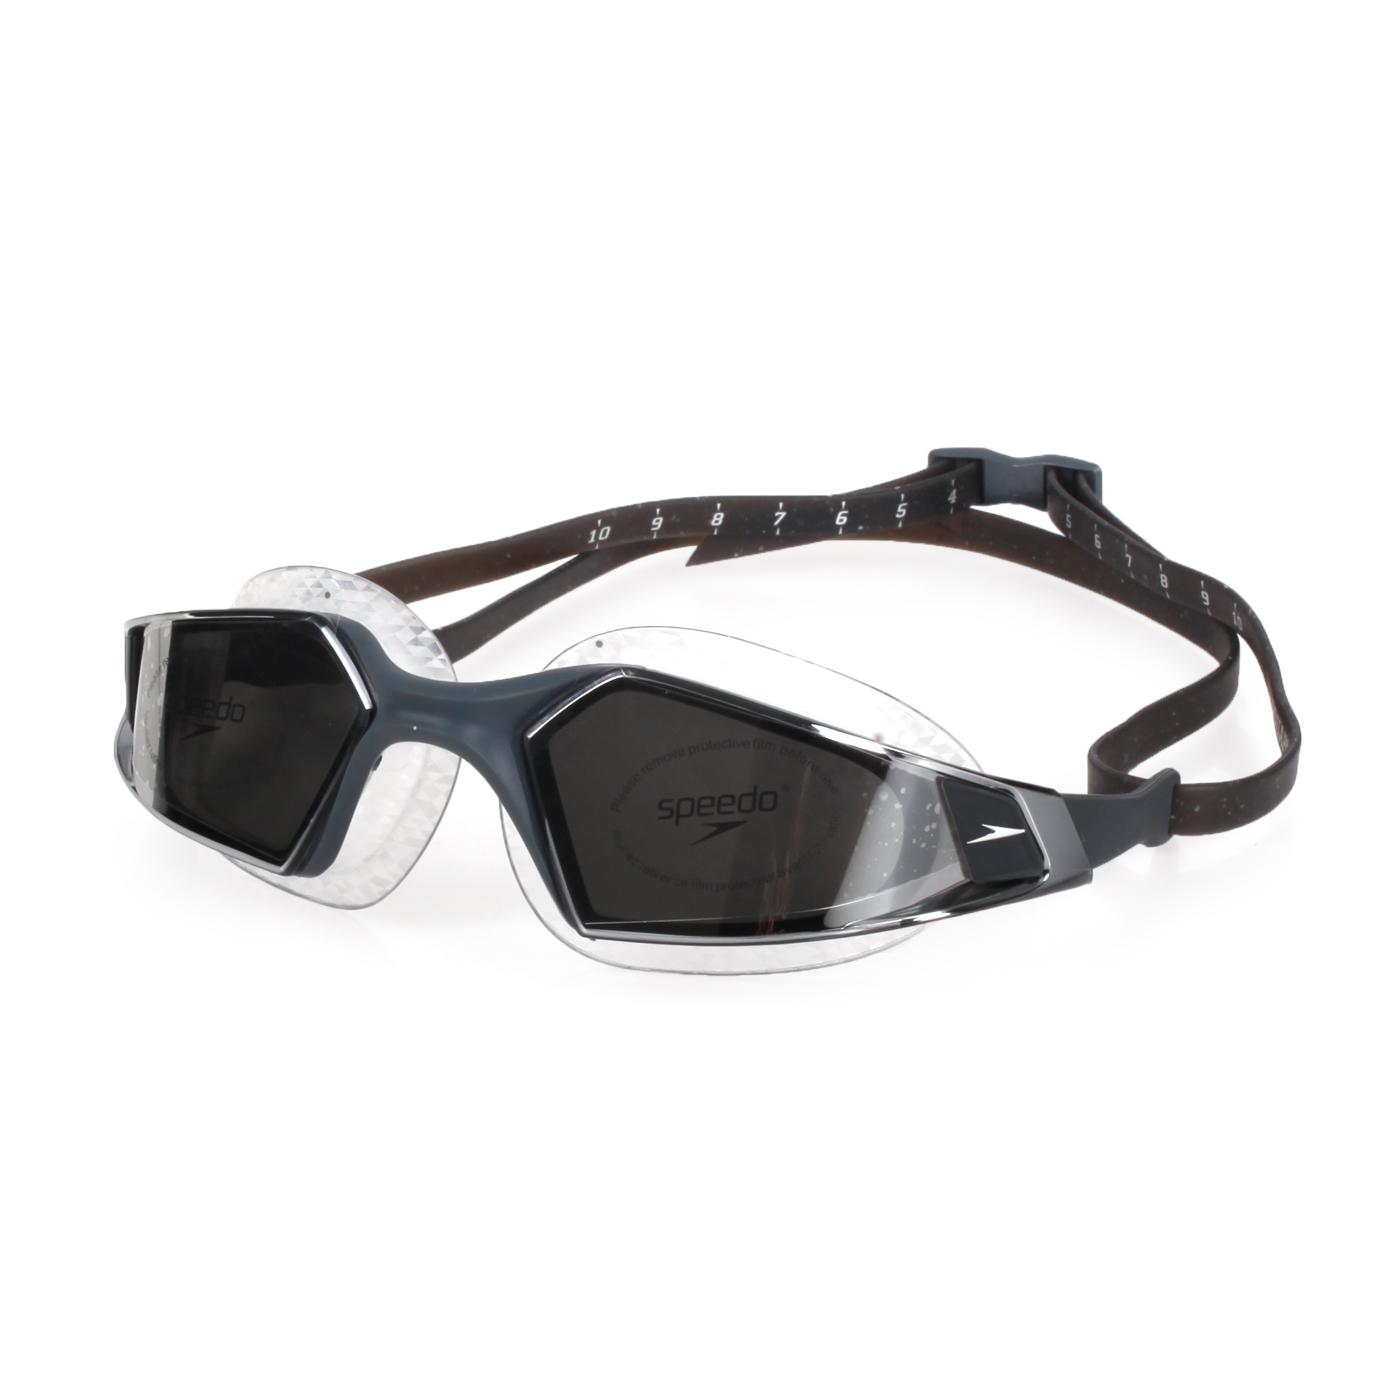 SPEEDO 成人運動泳鏡 鏡面 Aquapulse Pro SD812265D637